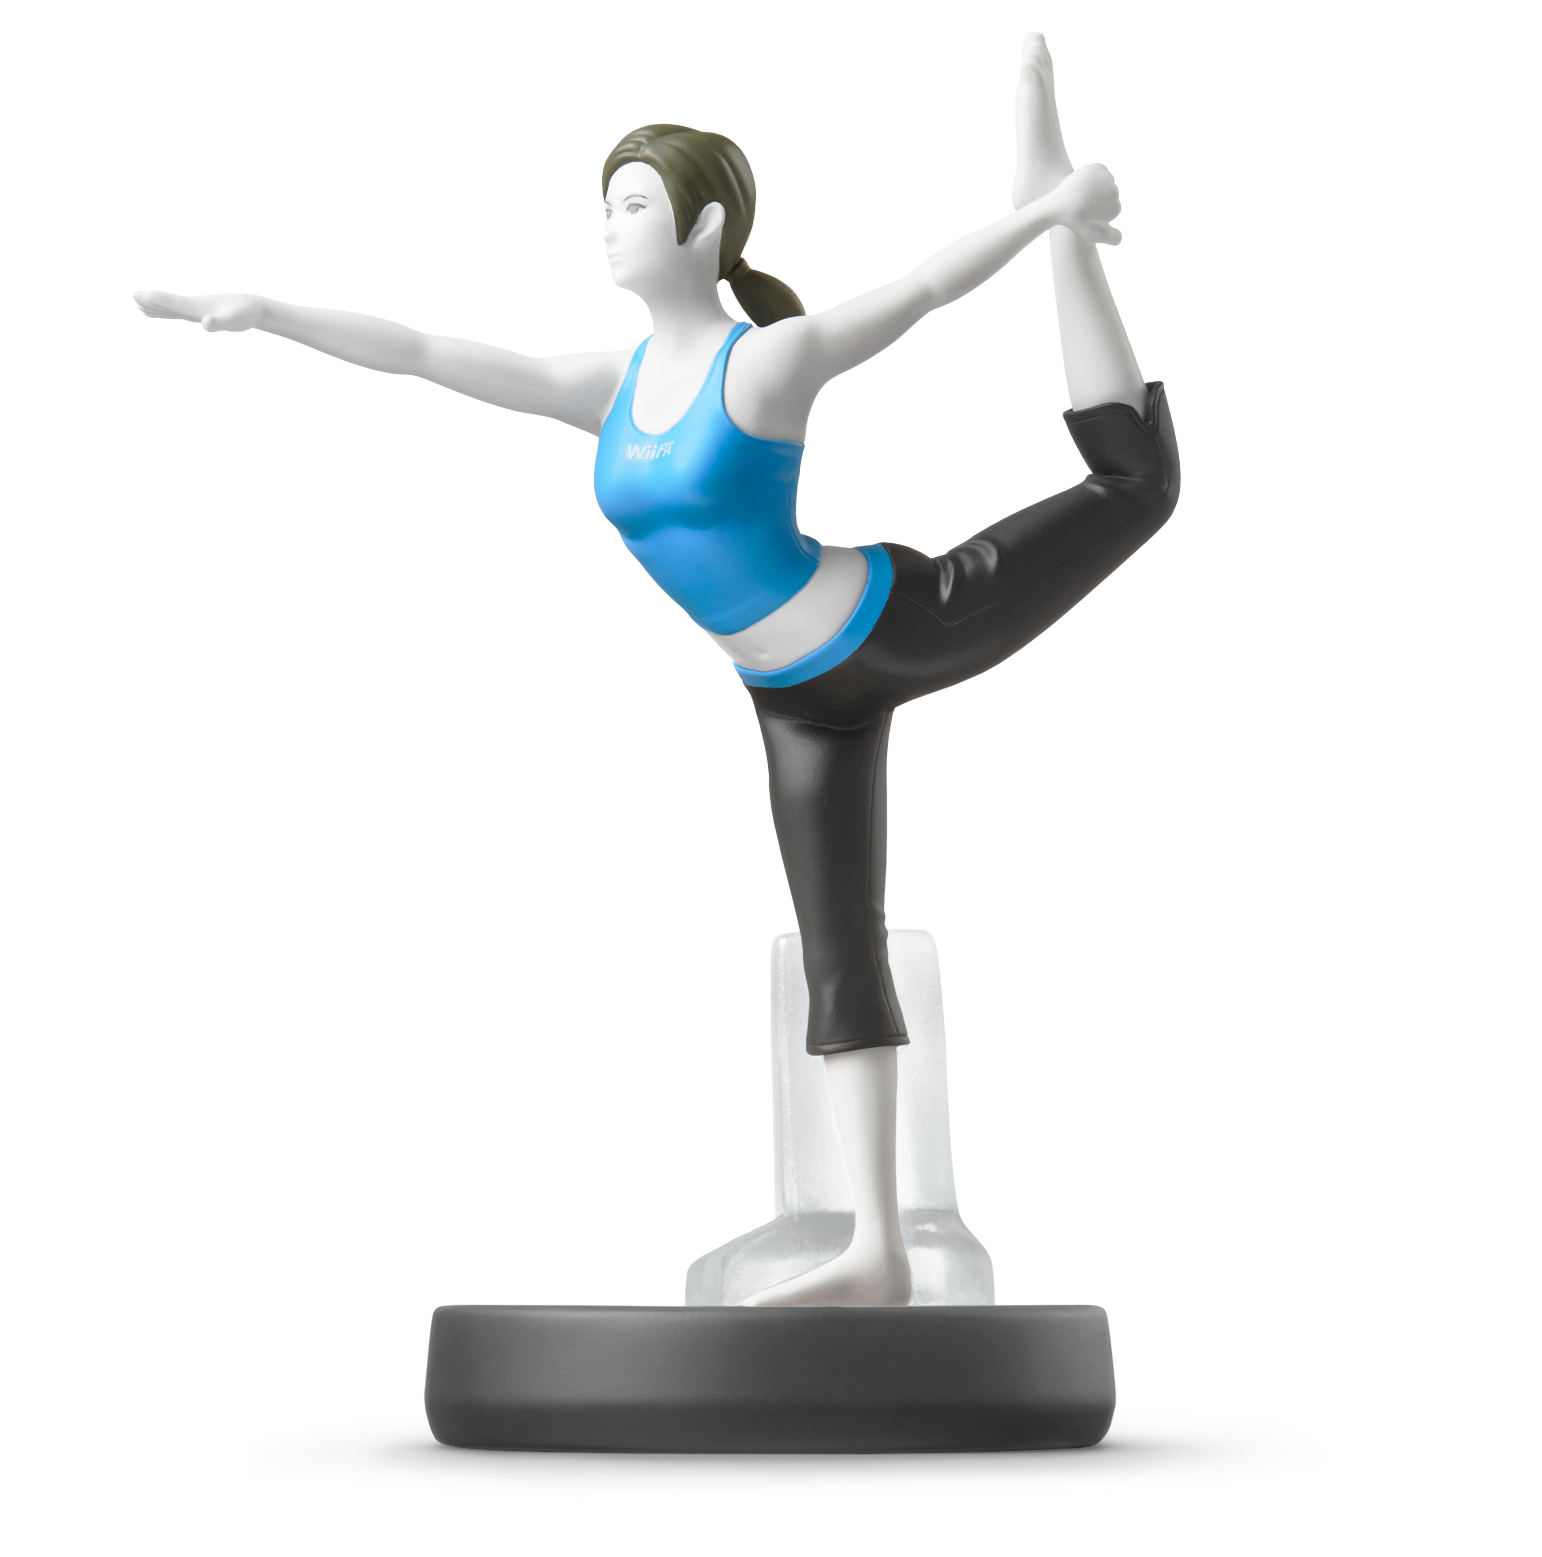 Amiibo/Wii Fit Trainer